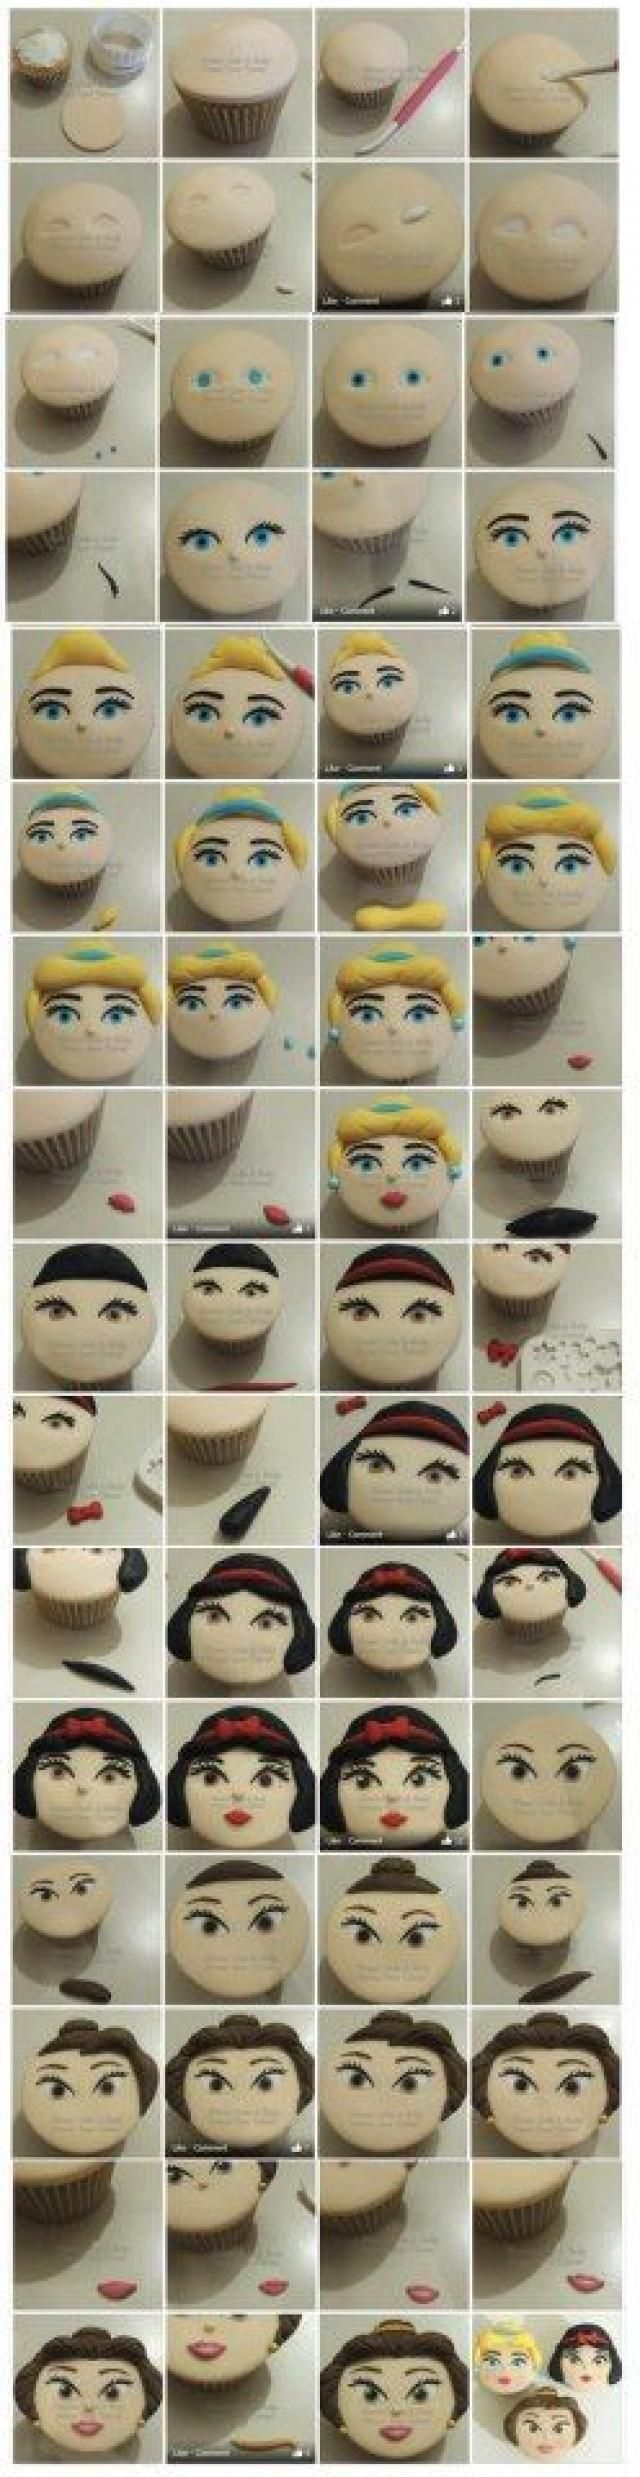 DIY - Cupcake Toppers